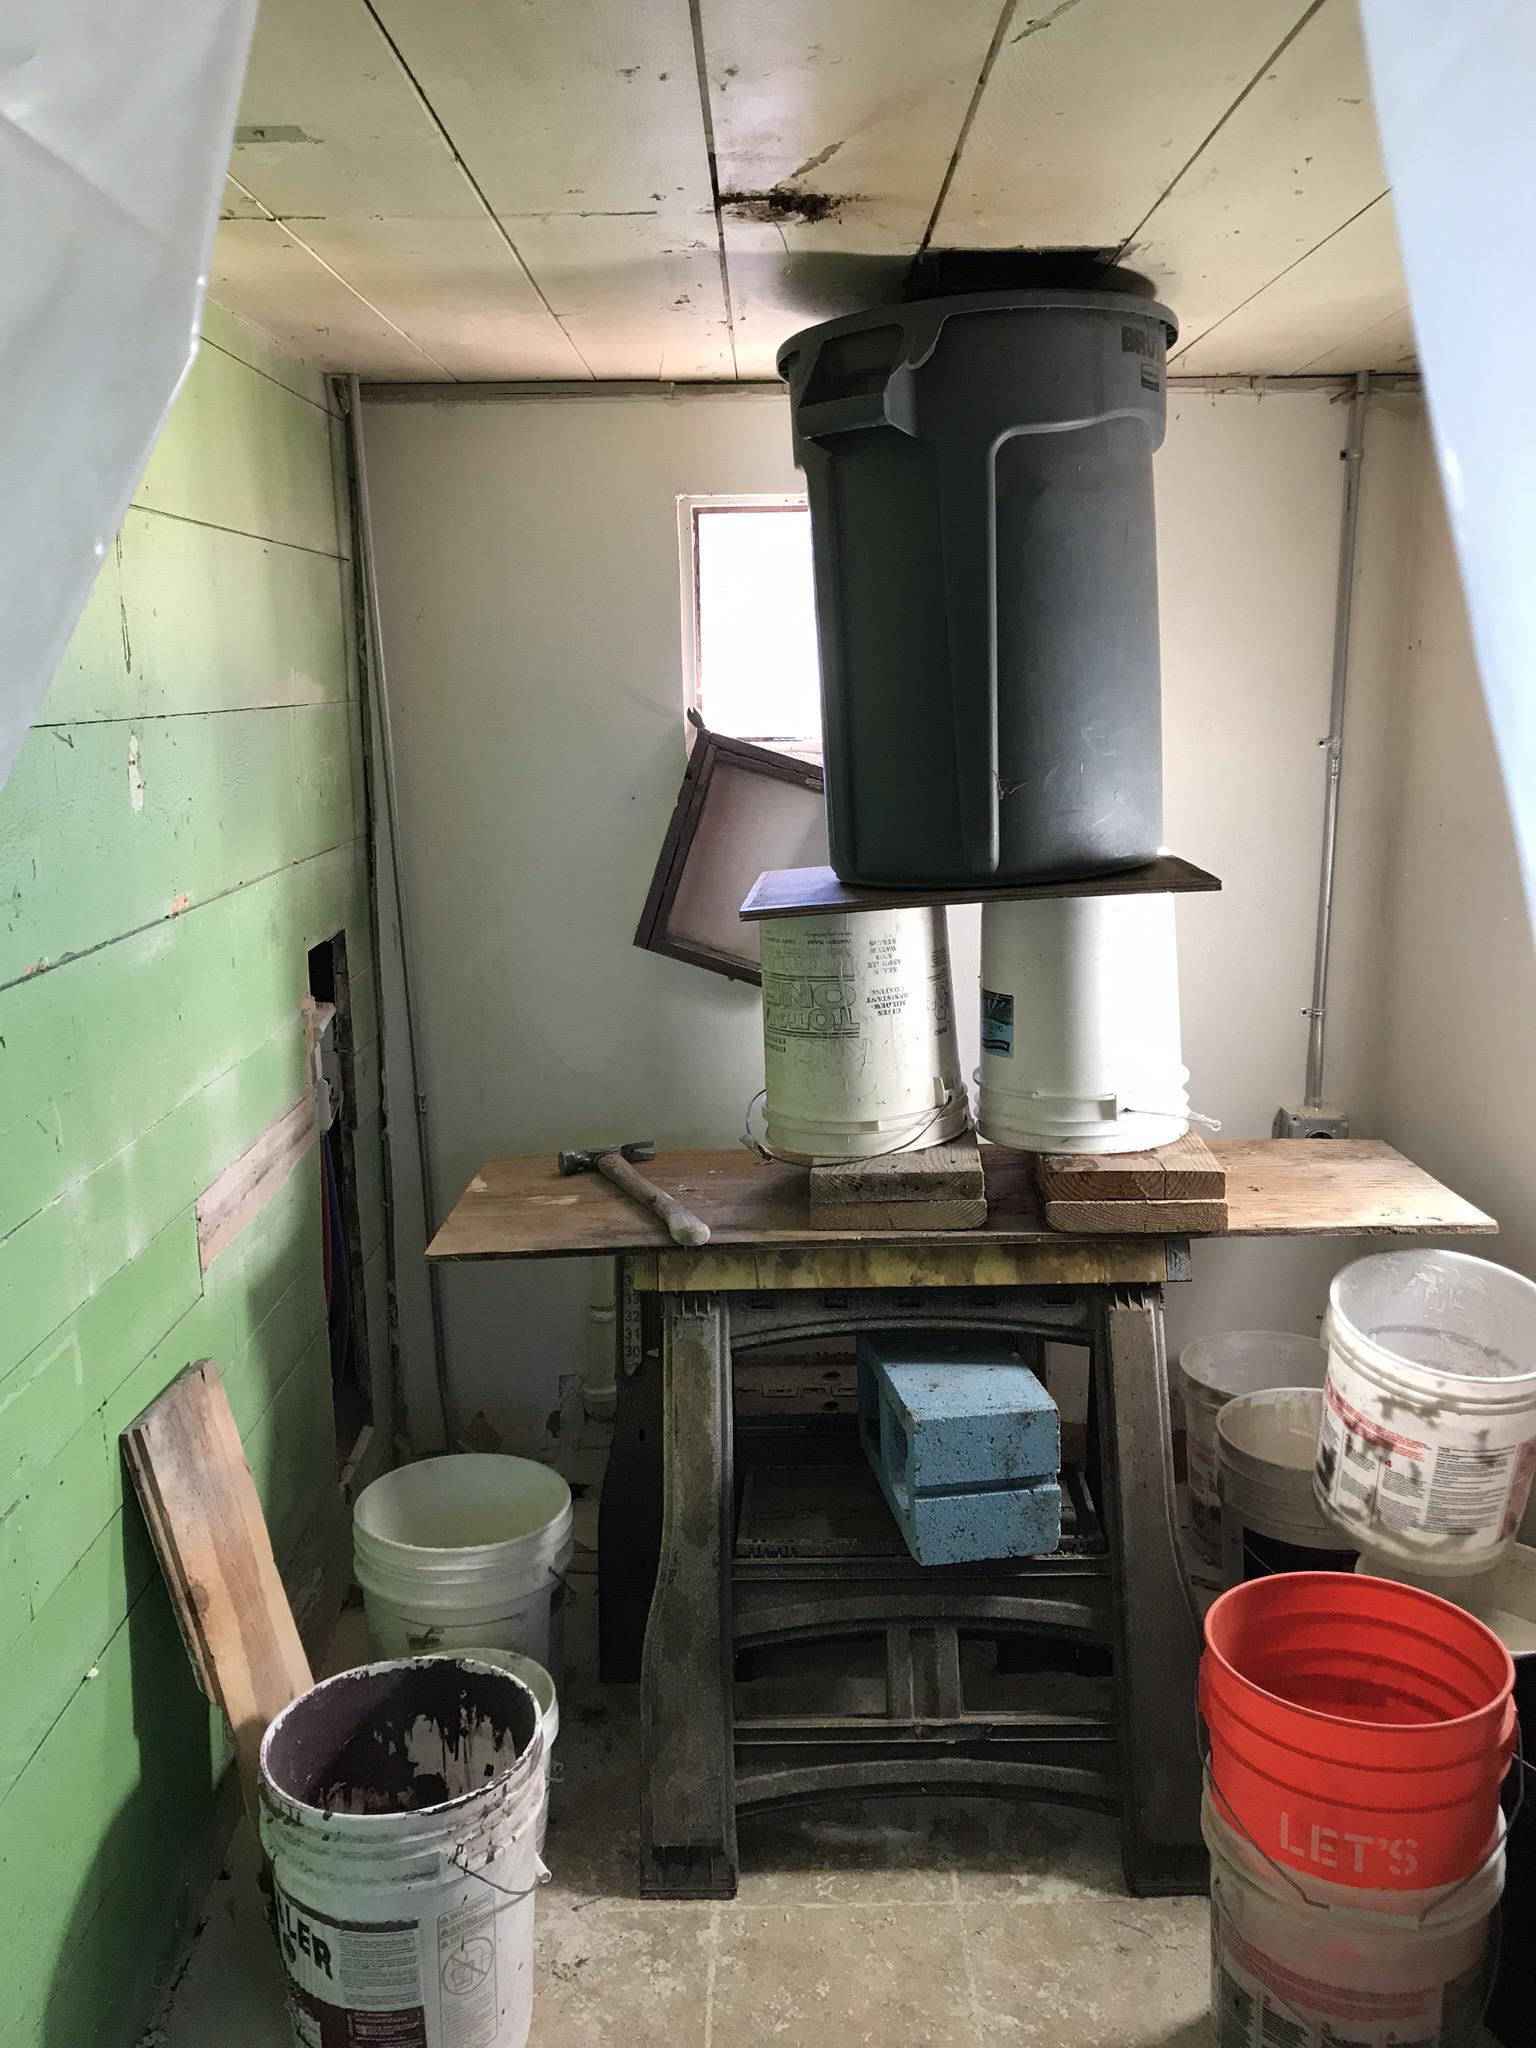 Dry Plaster as insulation????-01692893d0ebbacc7489859492423117f0cf44e688.jpg